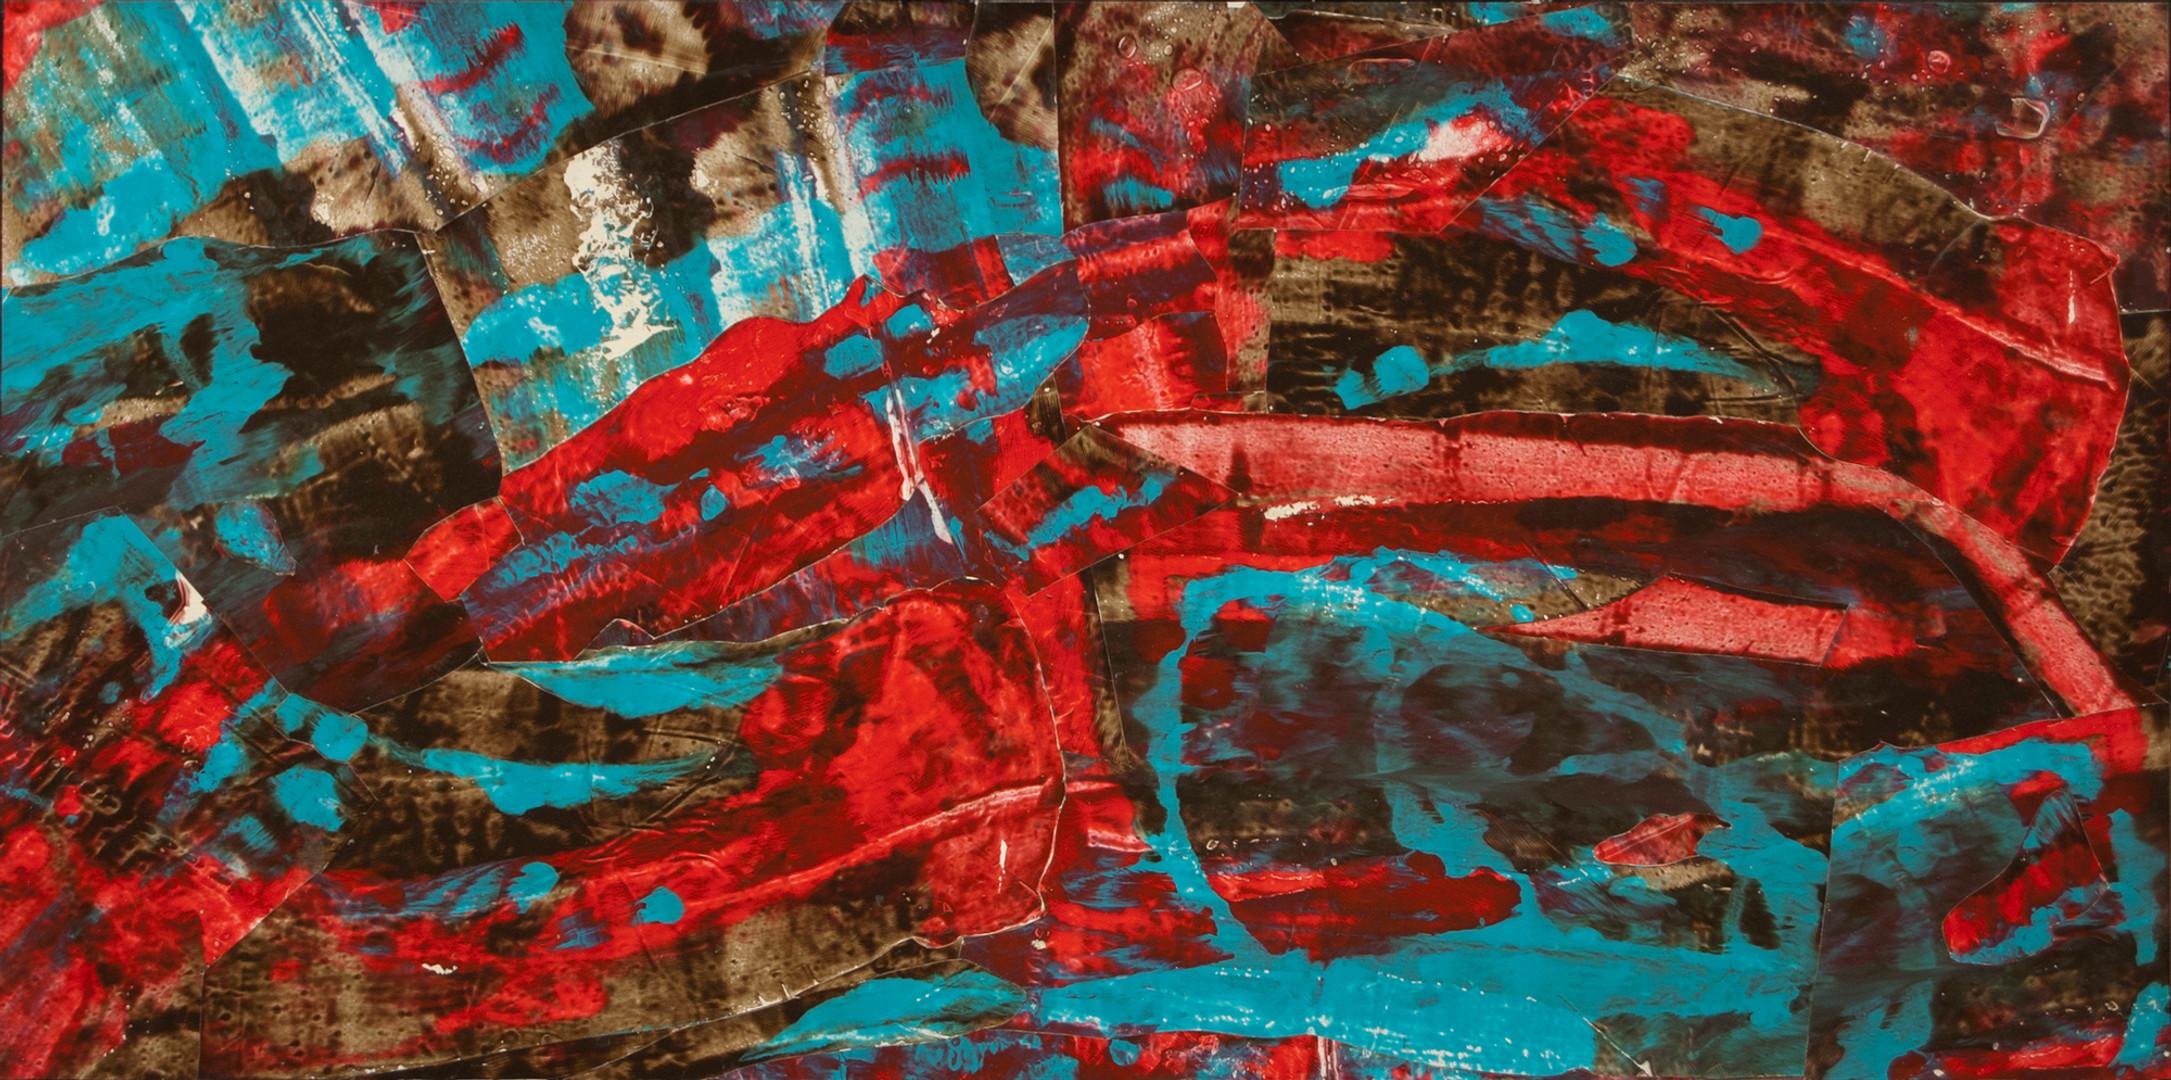 Scarab, acrylic on canvas, 48x24, 2018